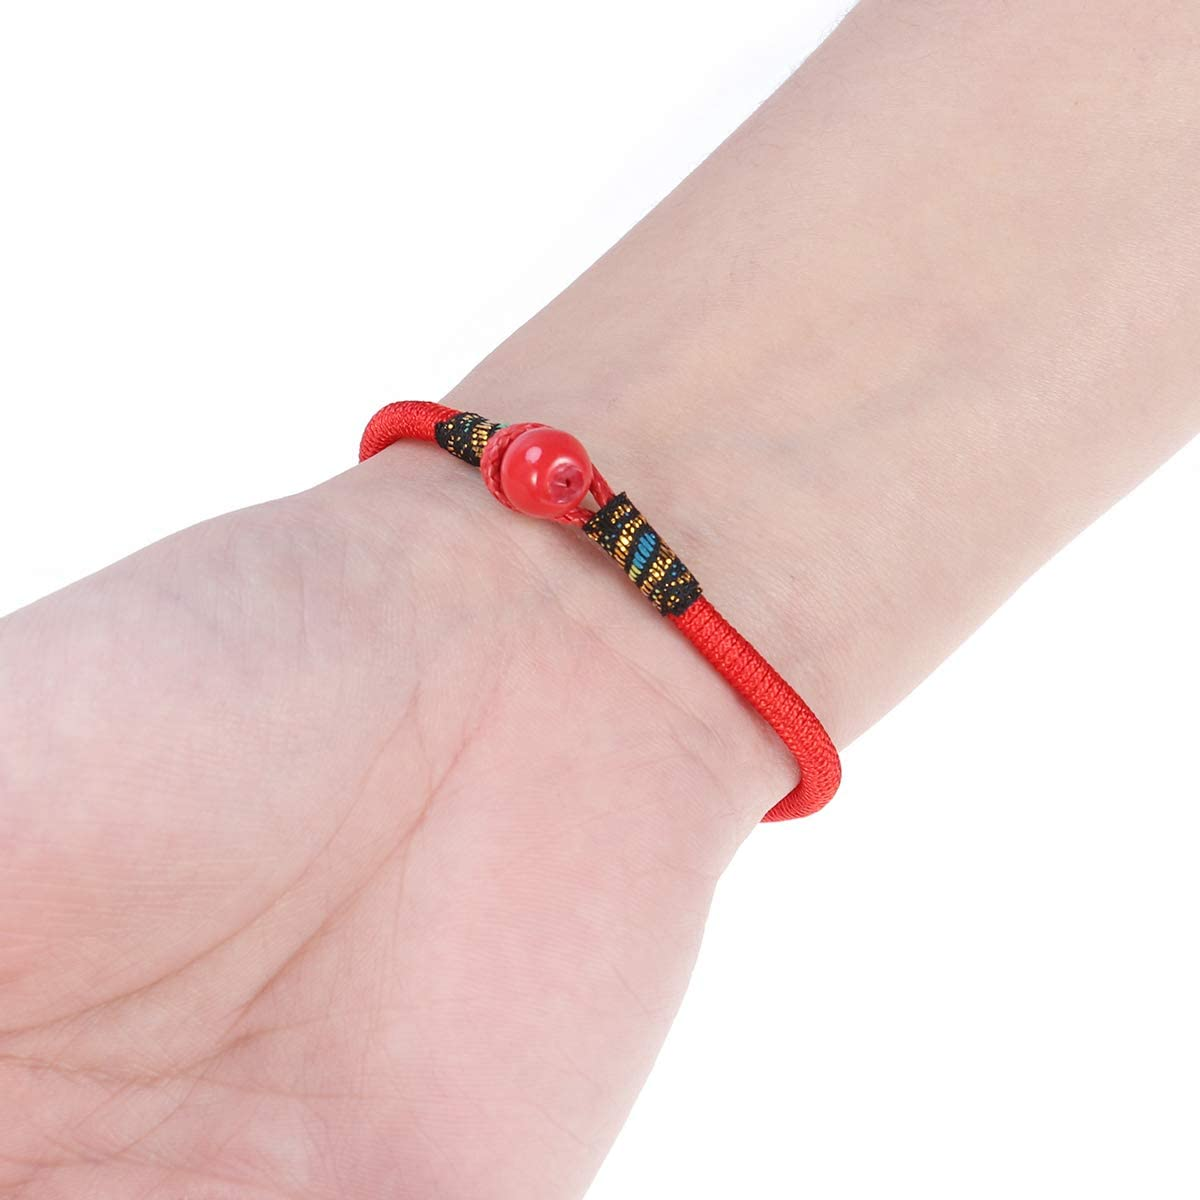 Stylish Ceramic Bracelet Women Jewelry Girlfriends Girls Couple Woven Knitted